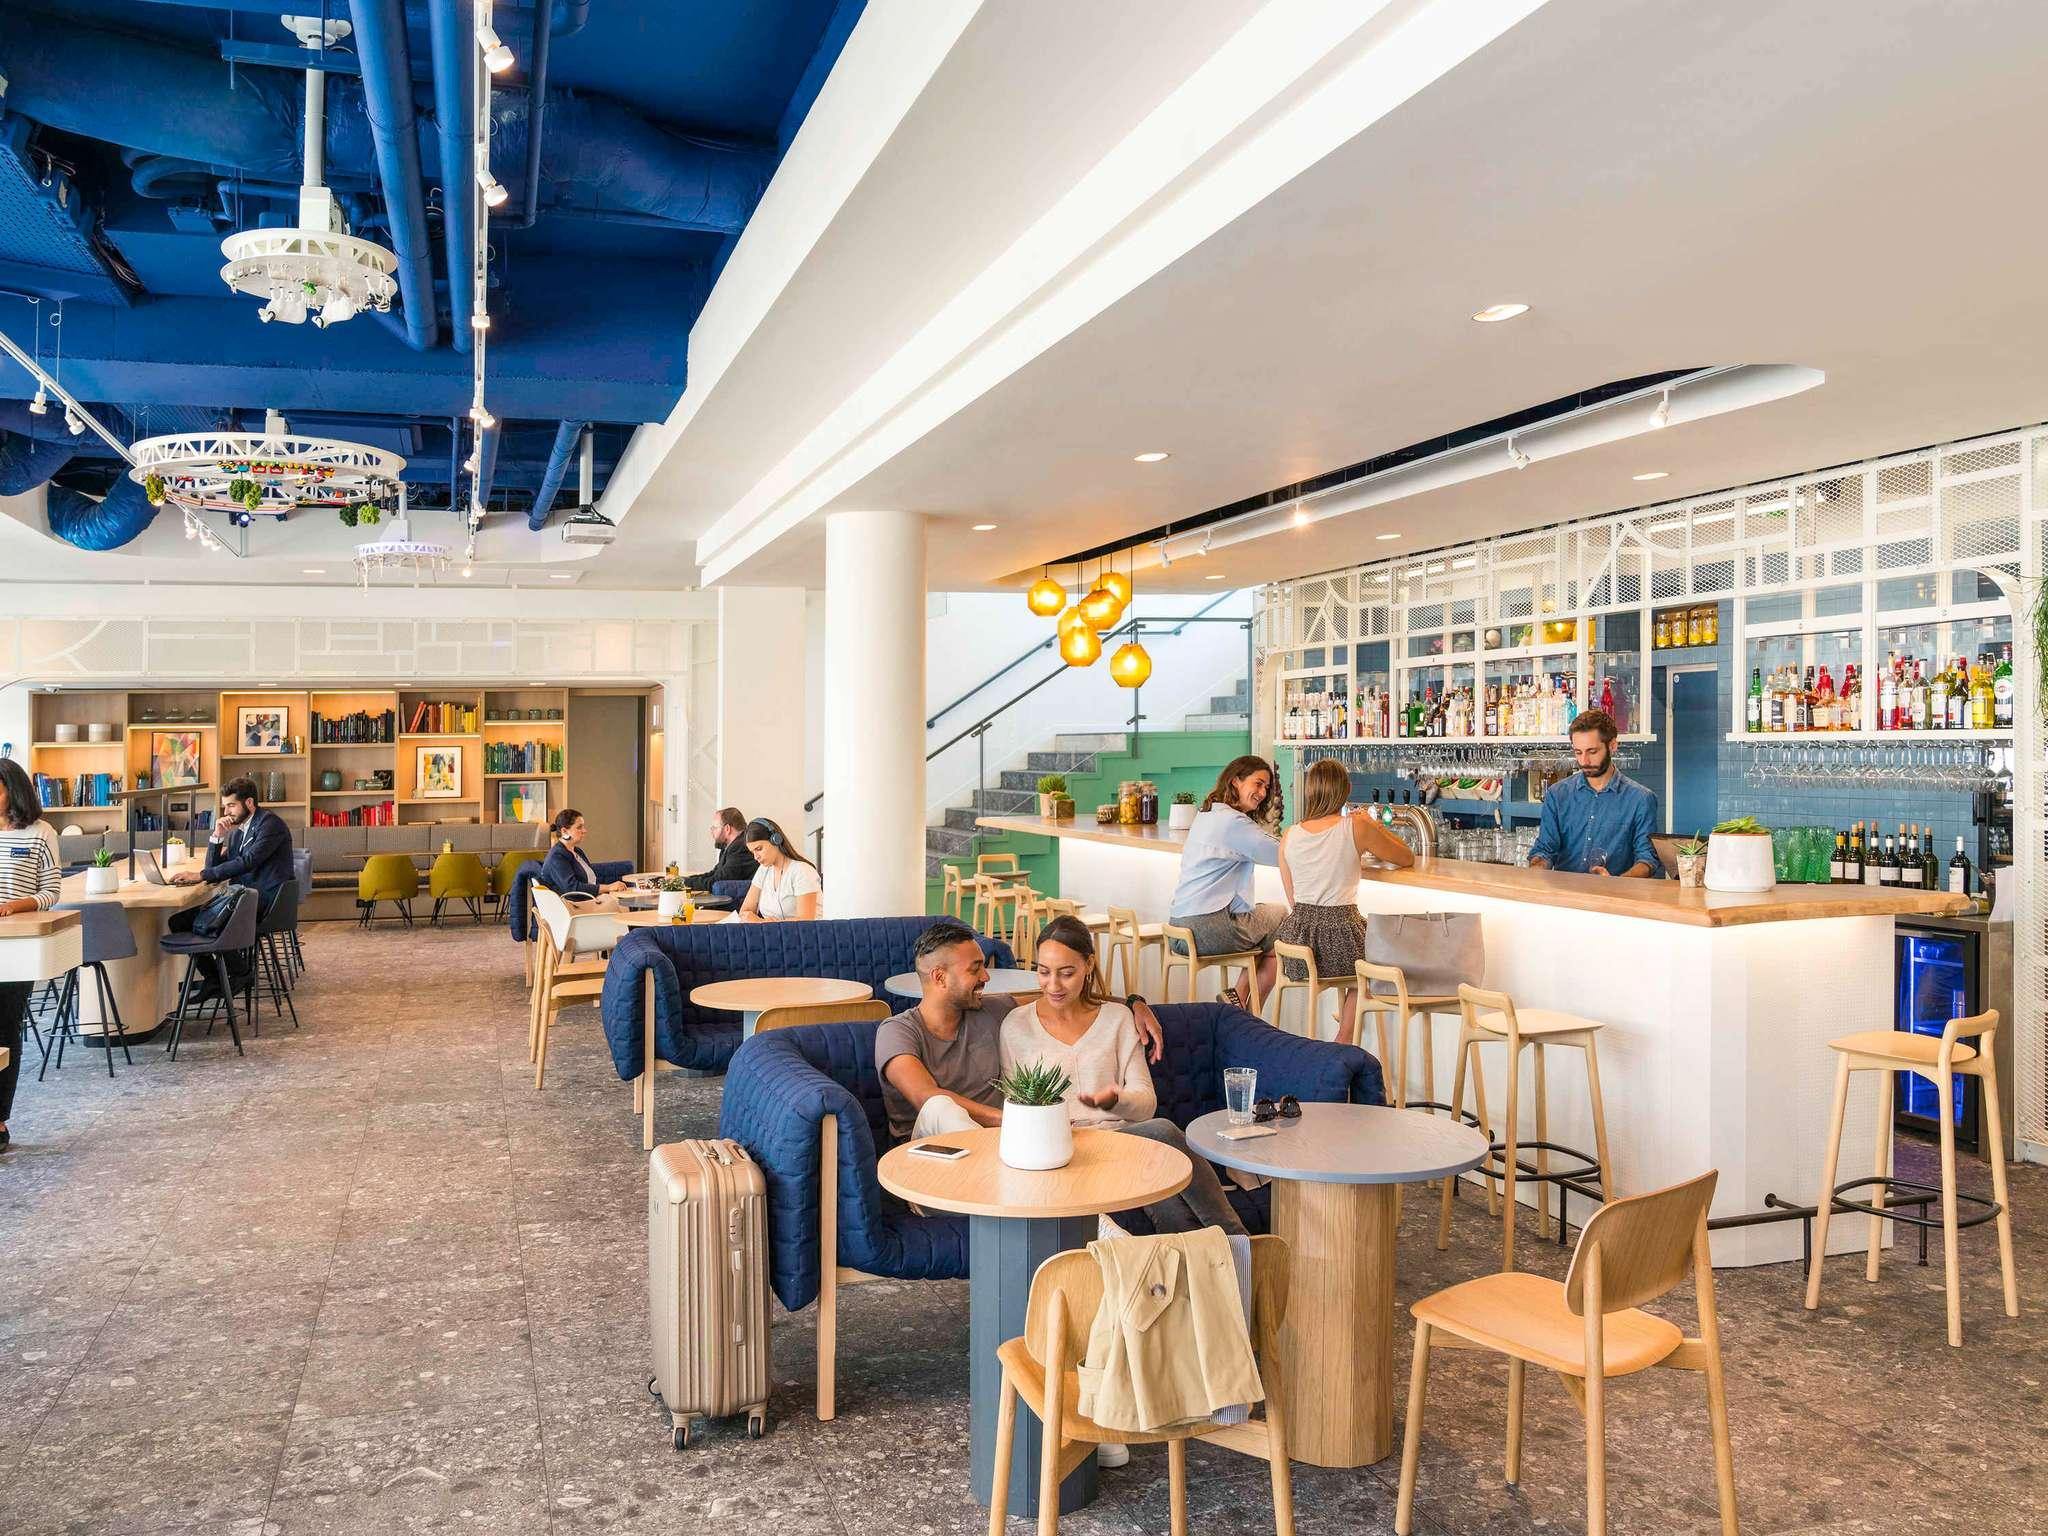 Hotel – Novotel Parijs Gare Montparnasse